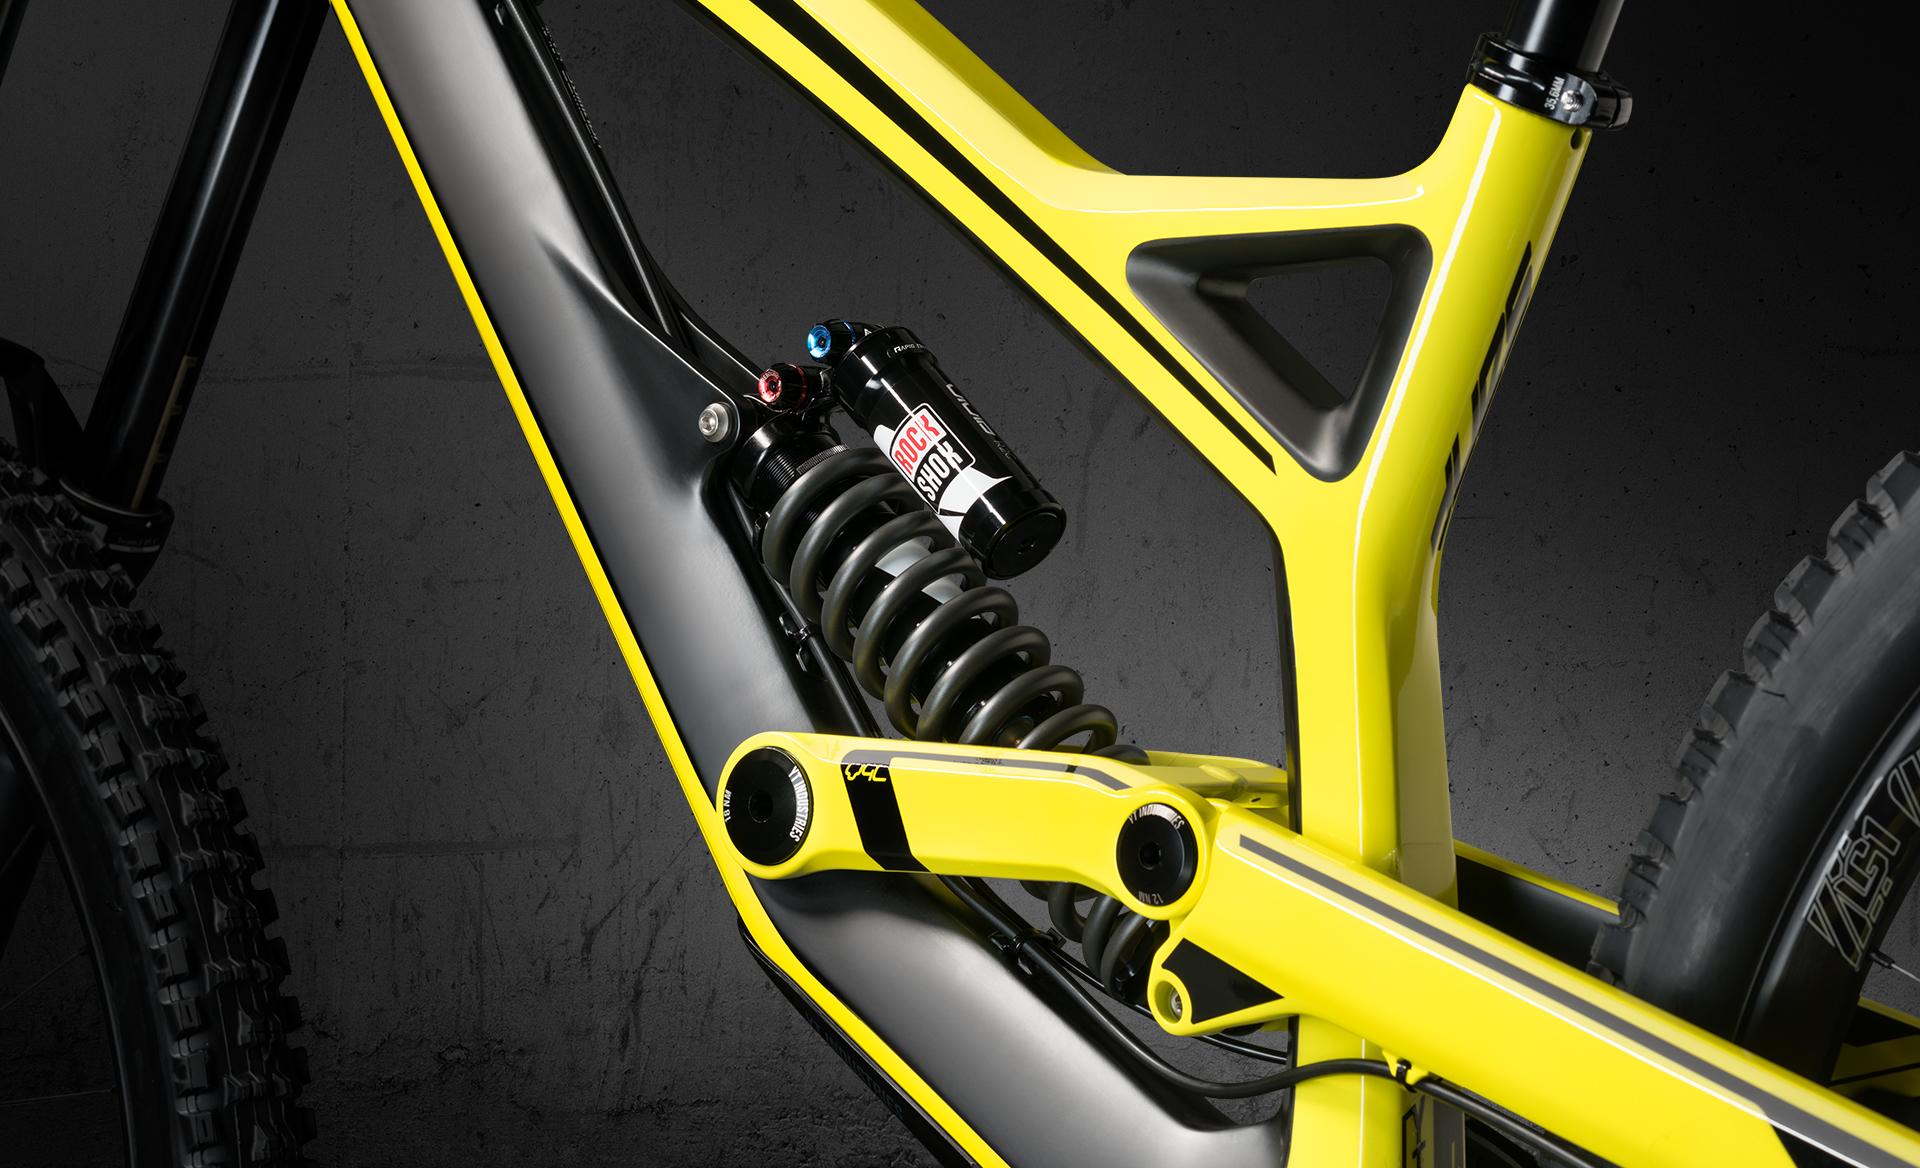 Tues_CF_yellow_daempfer_b1.jpg